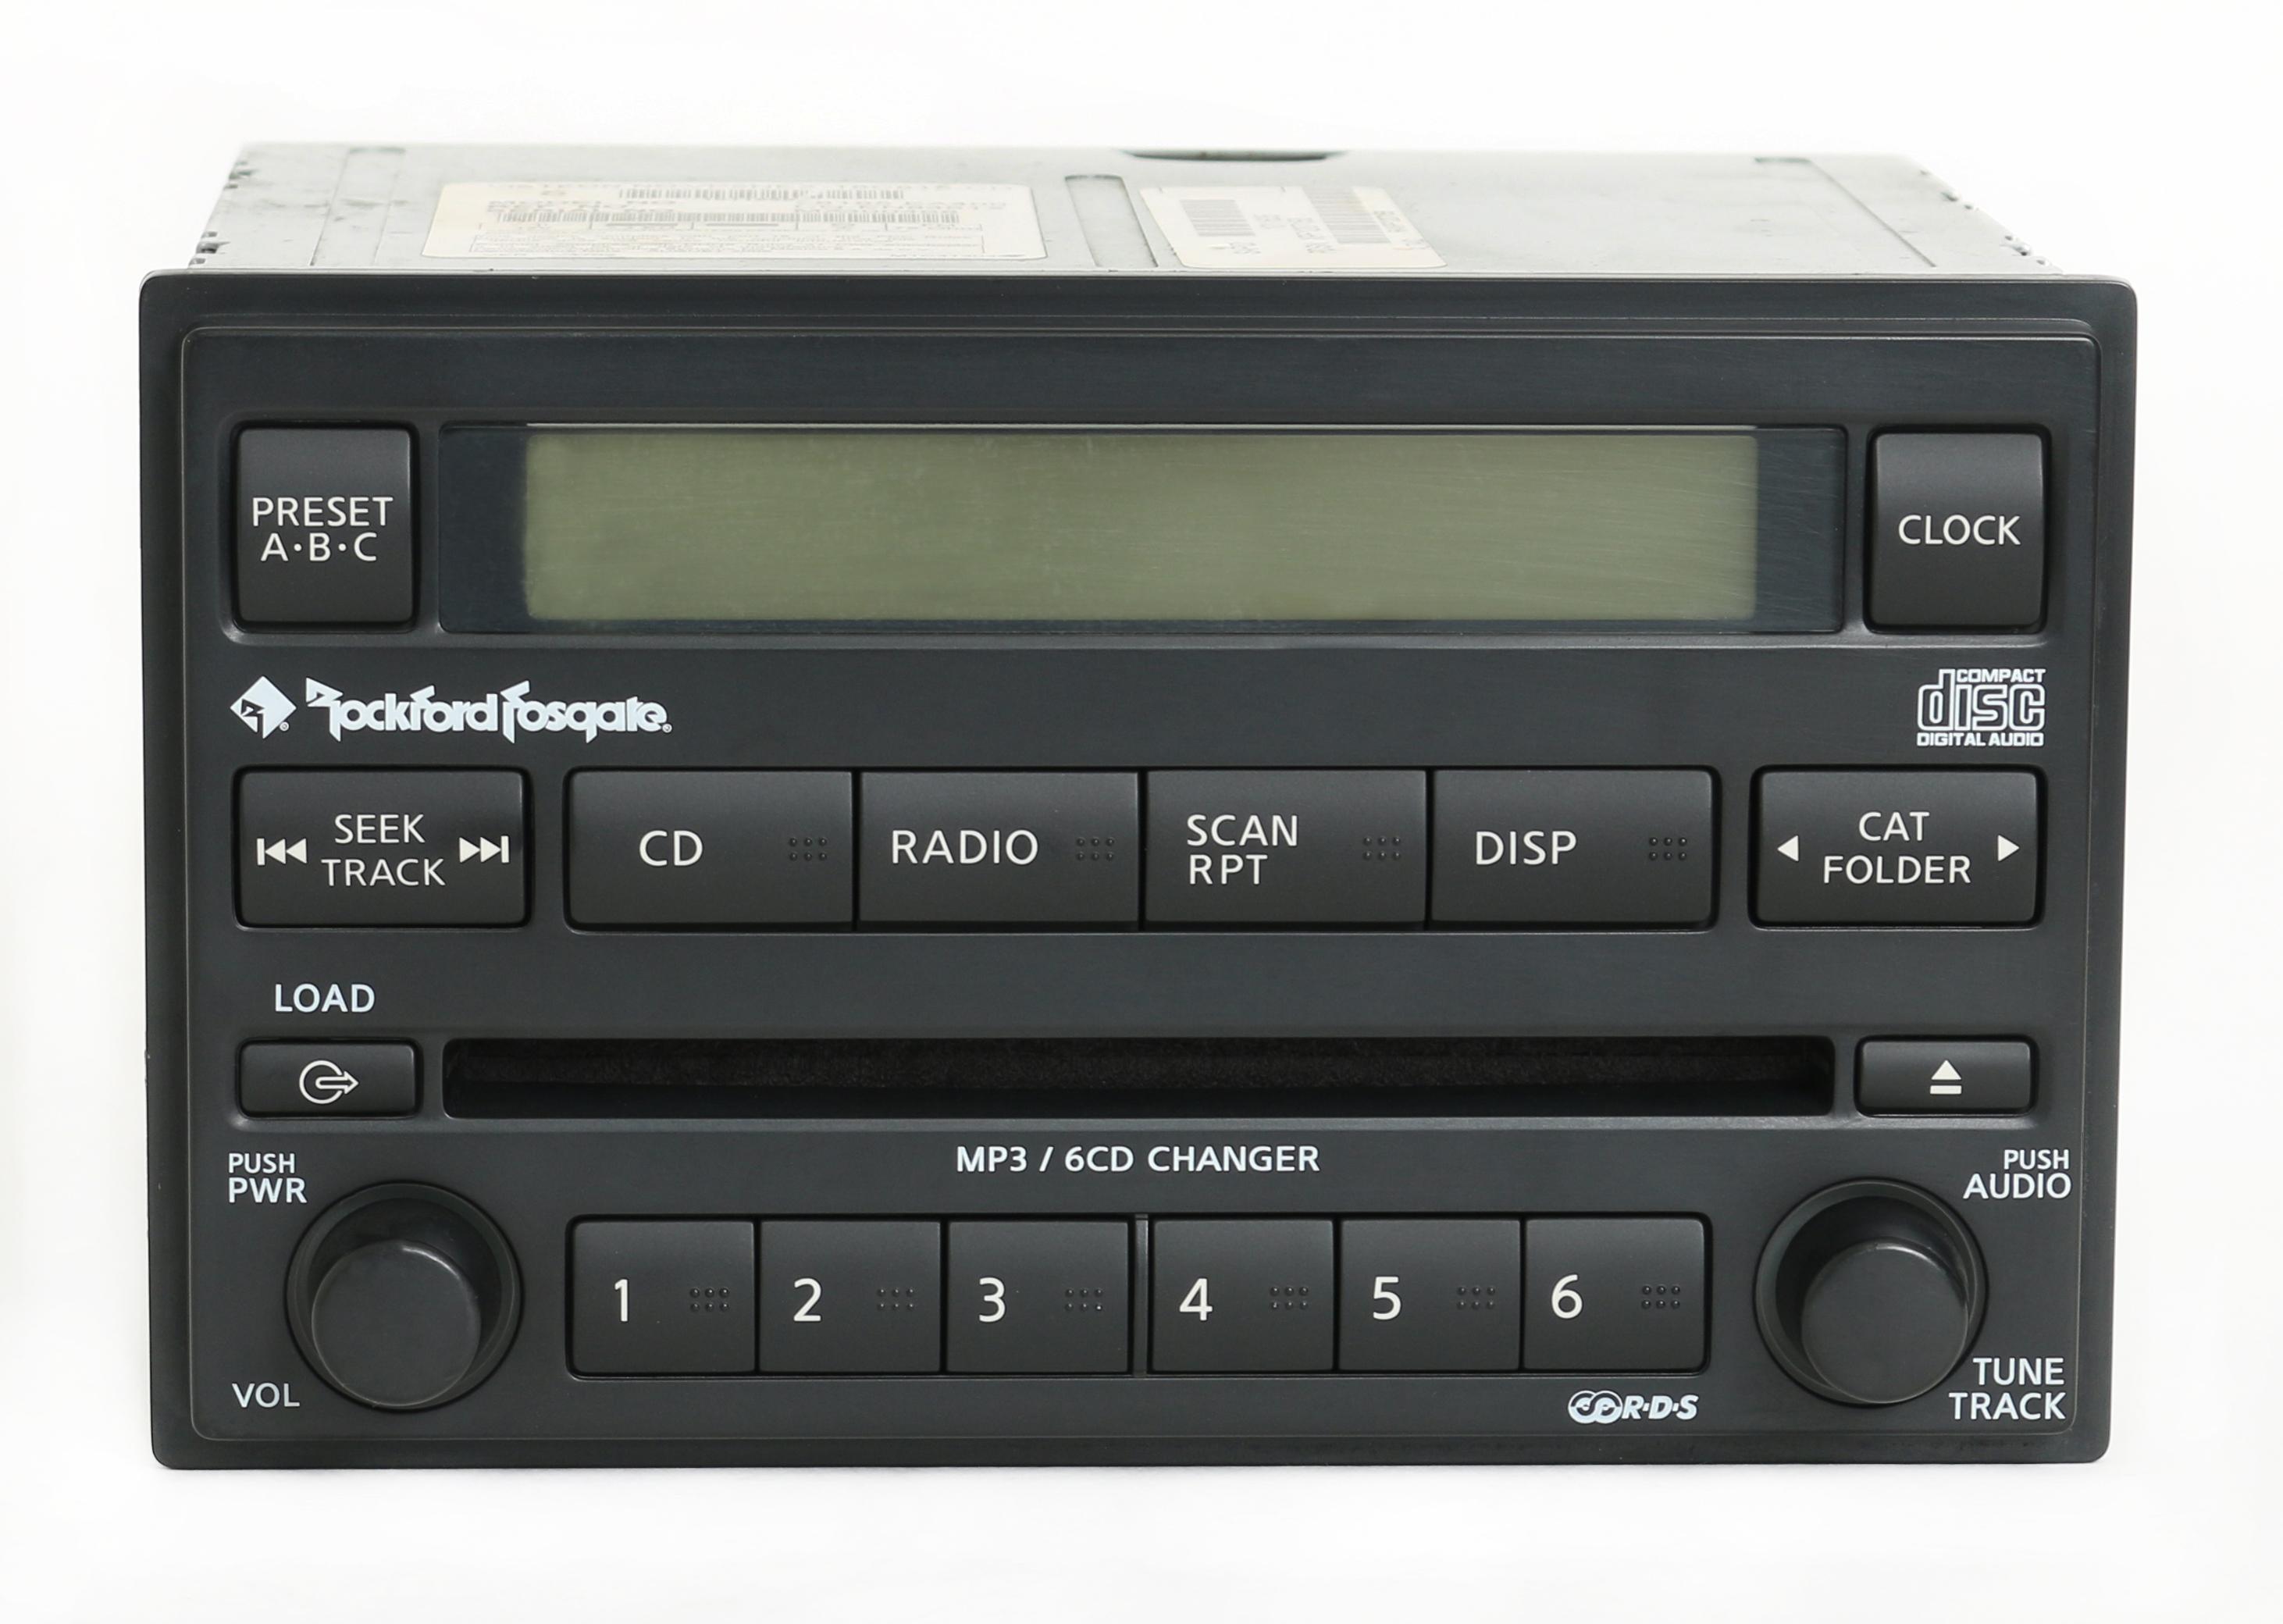 Nissan Xterra Frontier 2005 07 Rockford Fosgate Radio AM FM 6 Disc